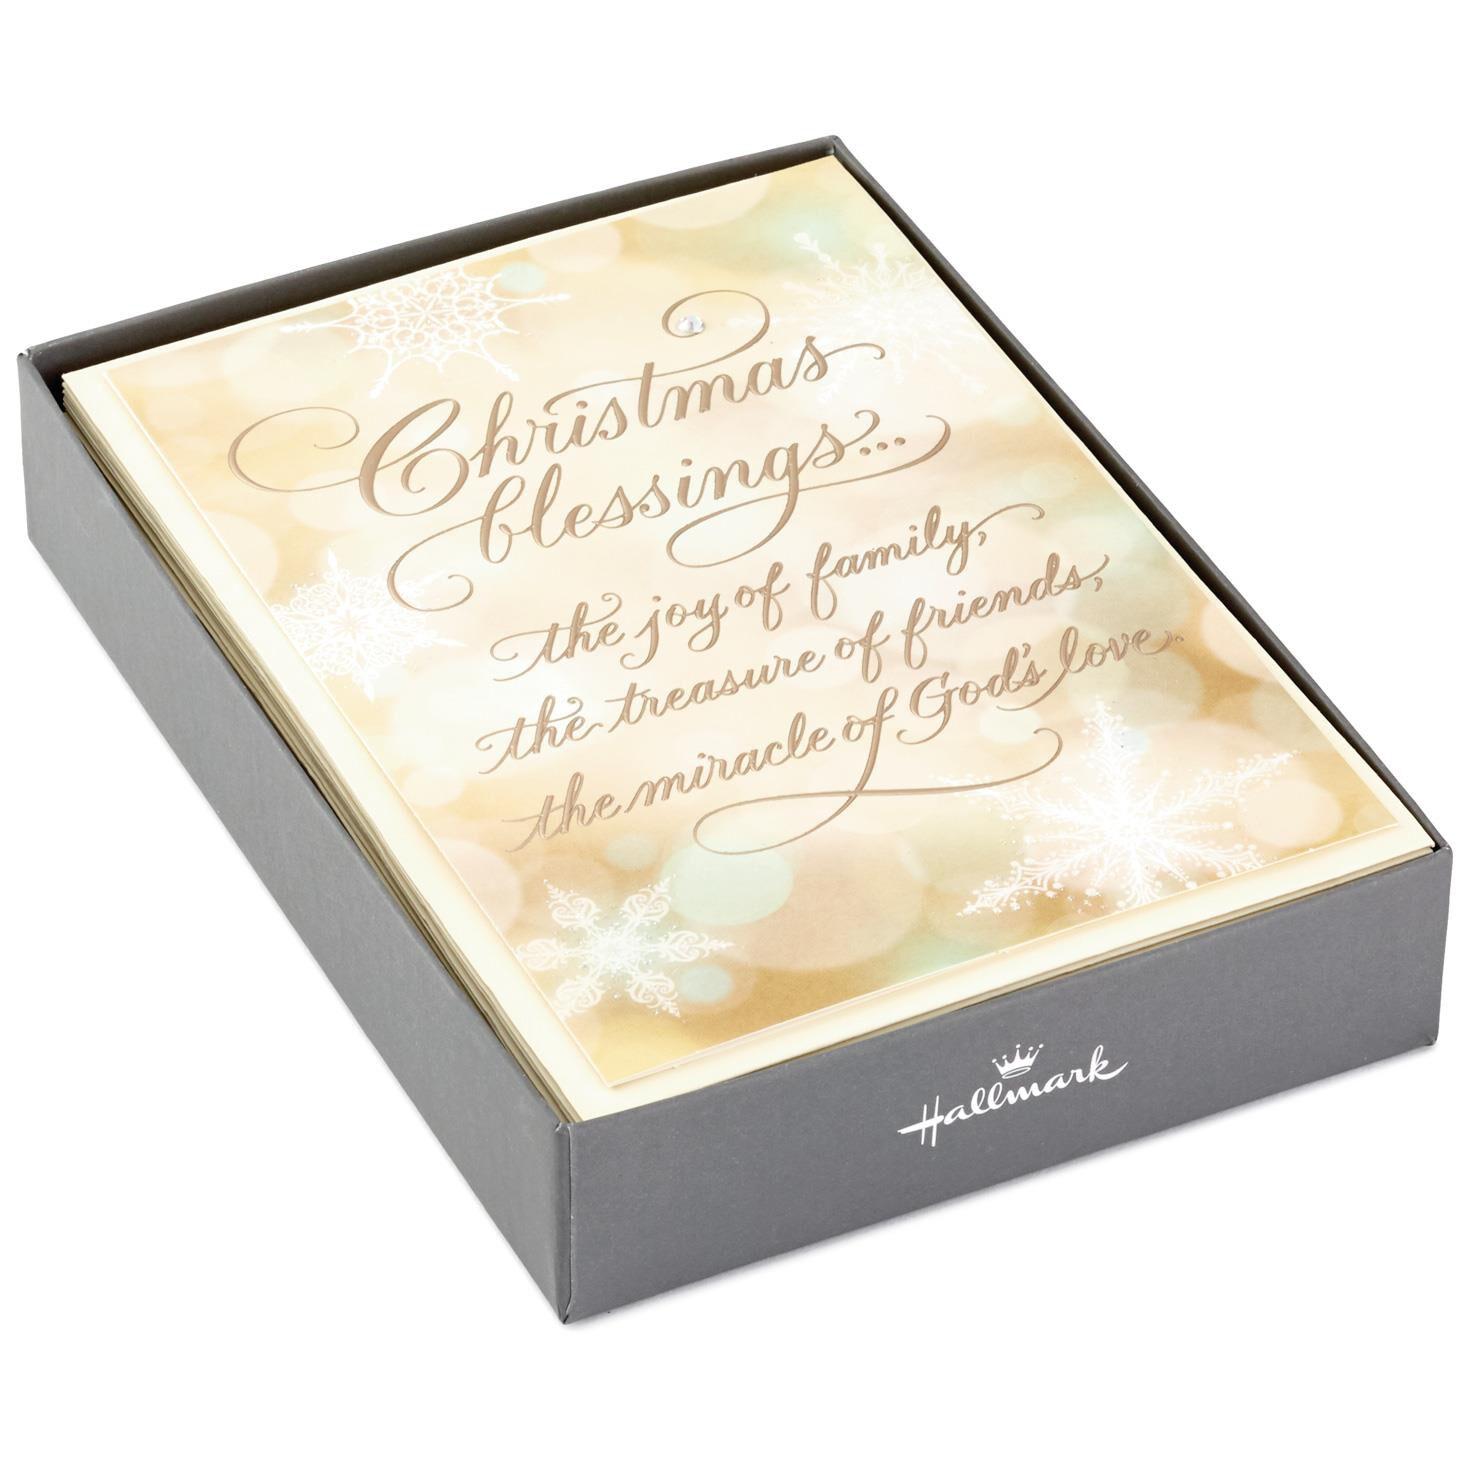 Hallmark Christmas Cards Box | www.topsimages.com